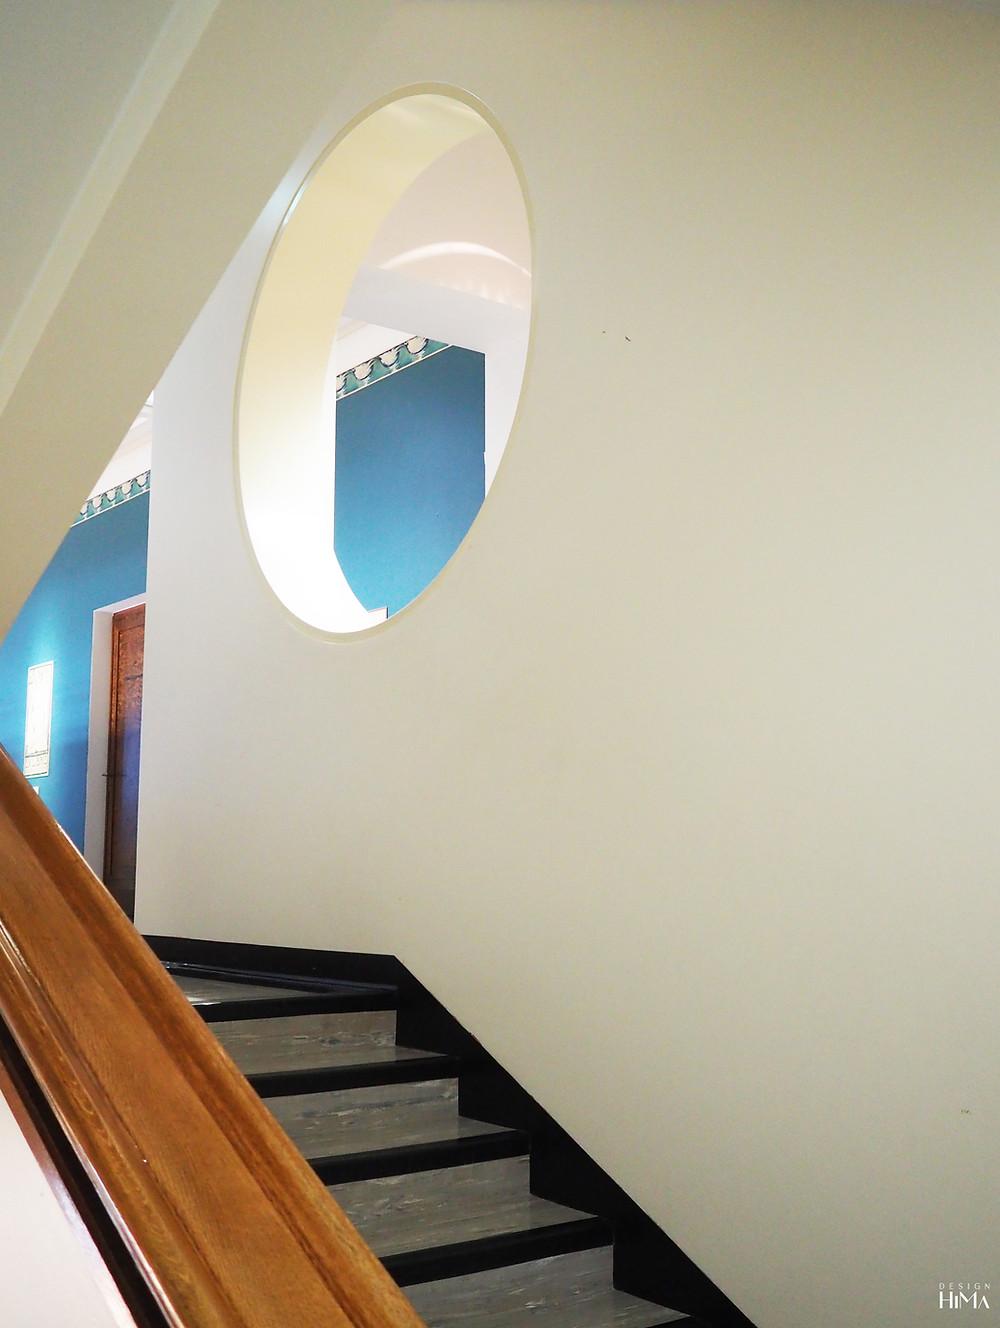 Gustaf-museo portaikko